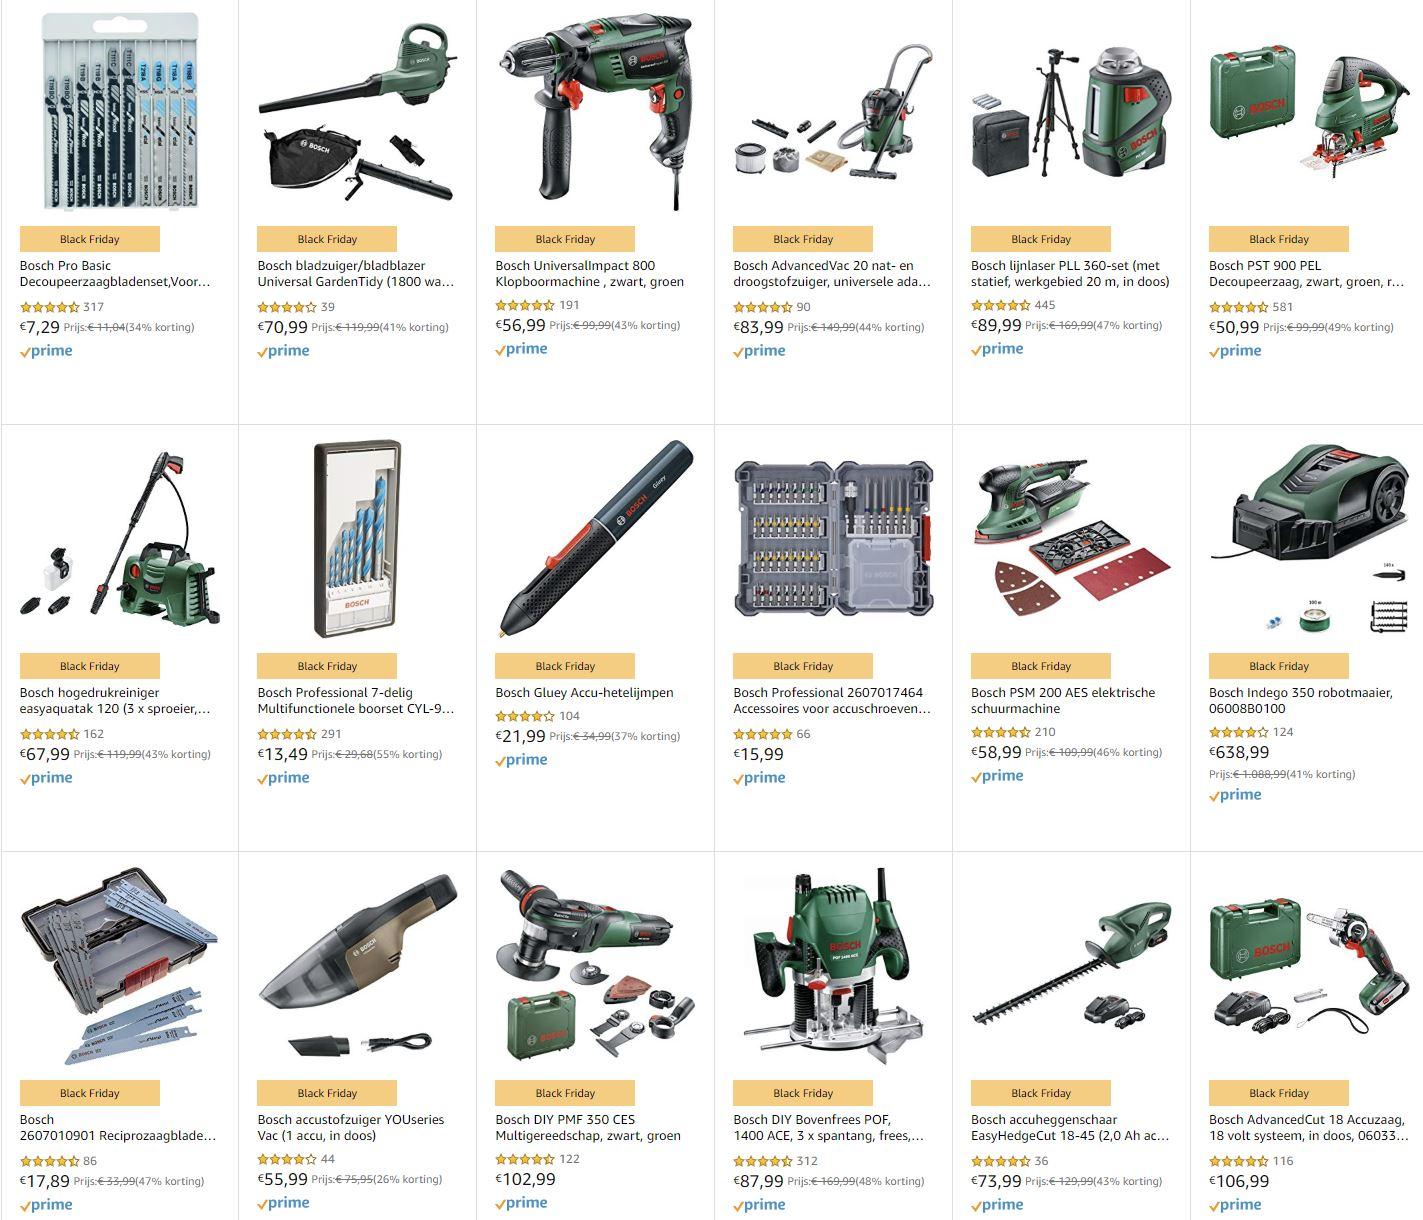 Bosch Black Friday Deals @Amazon